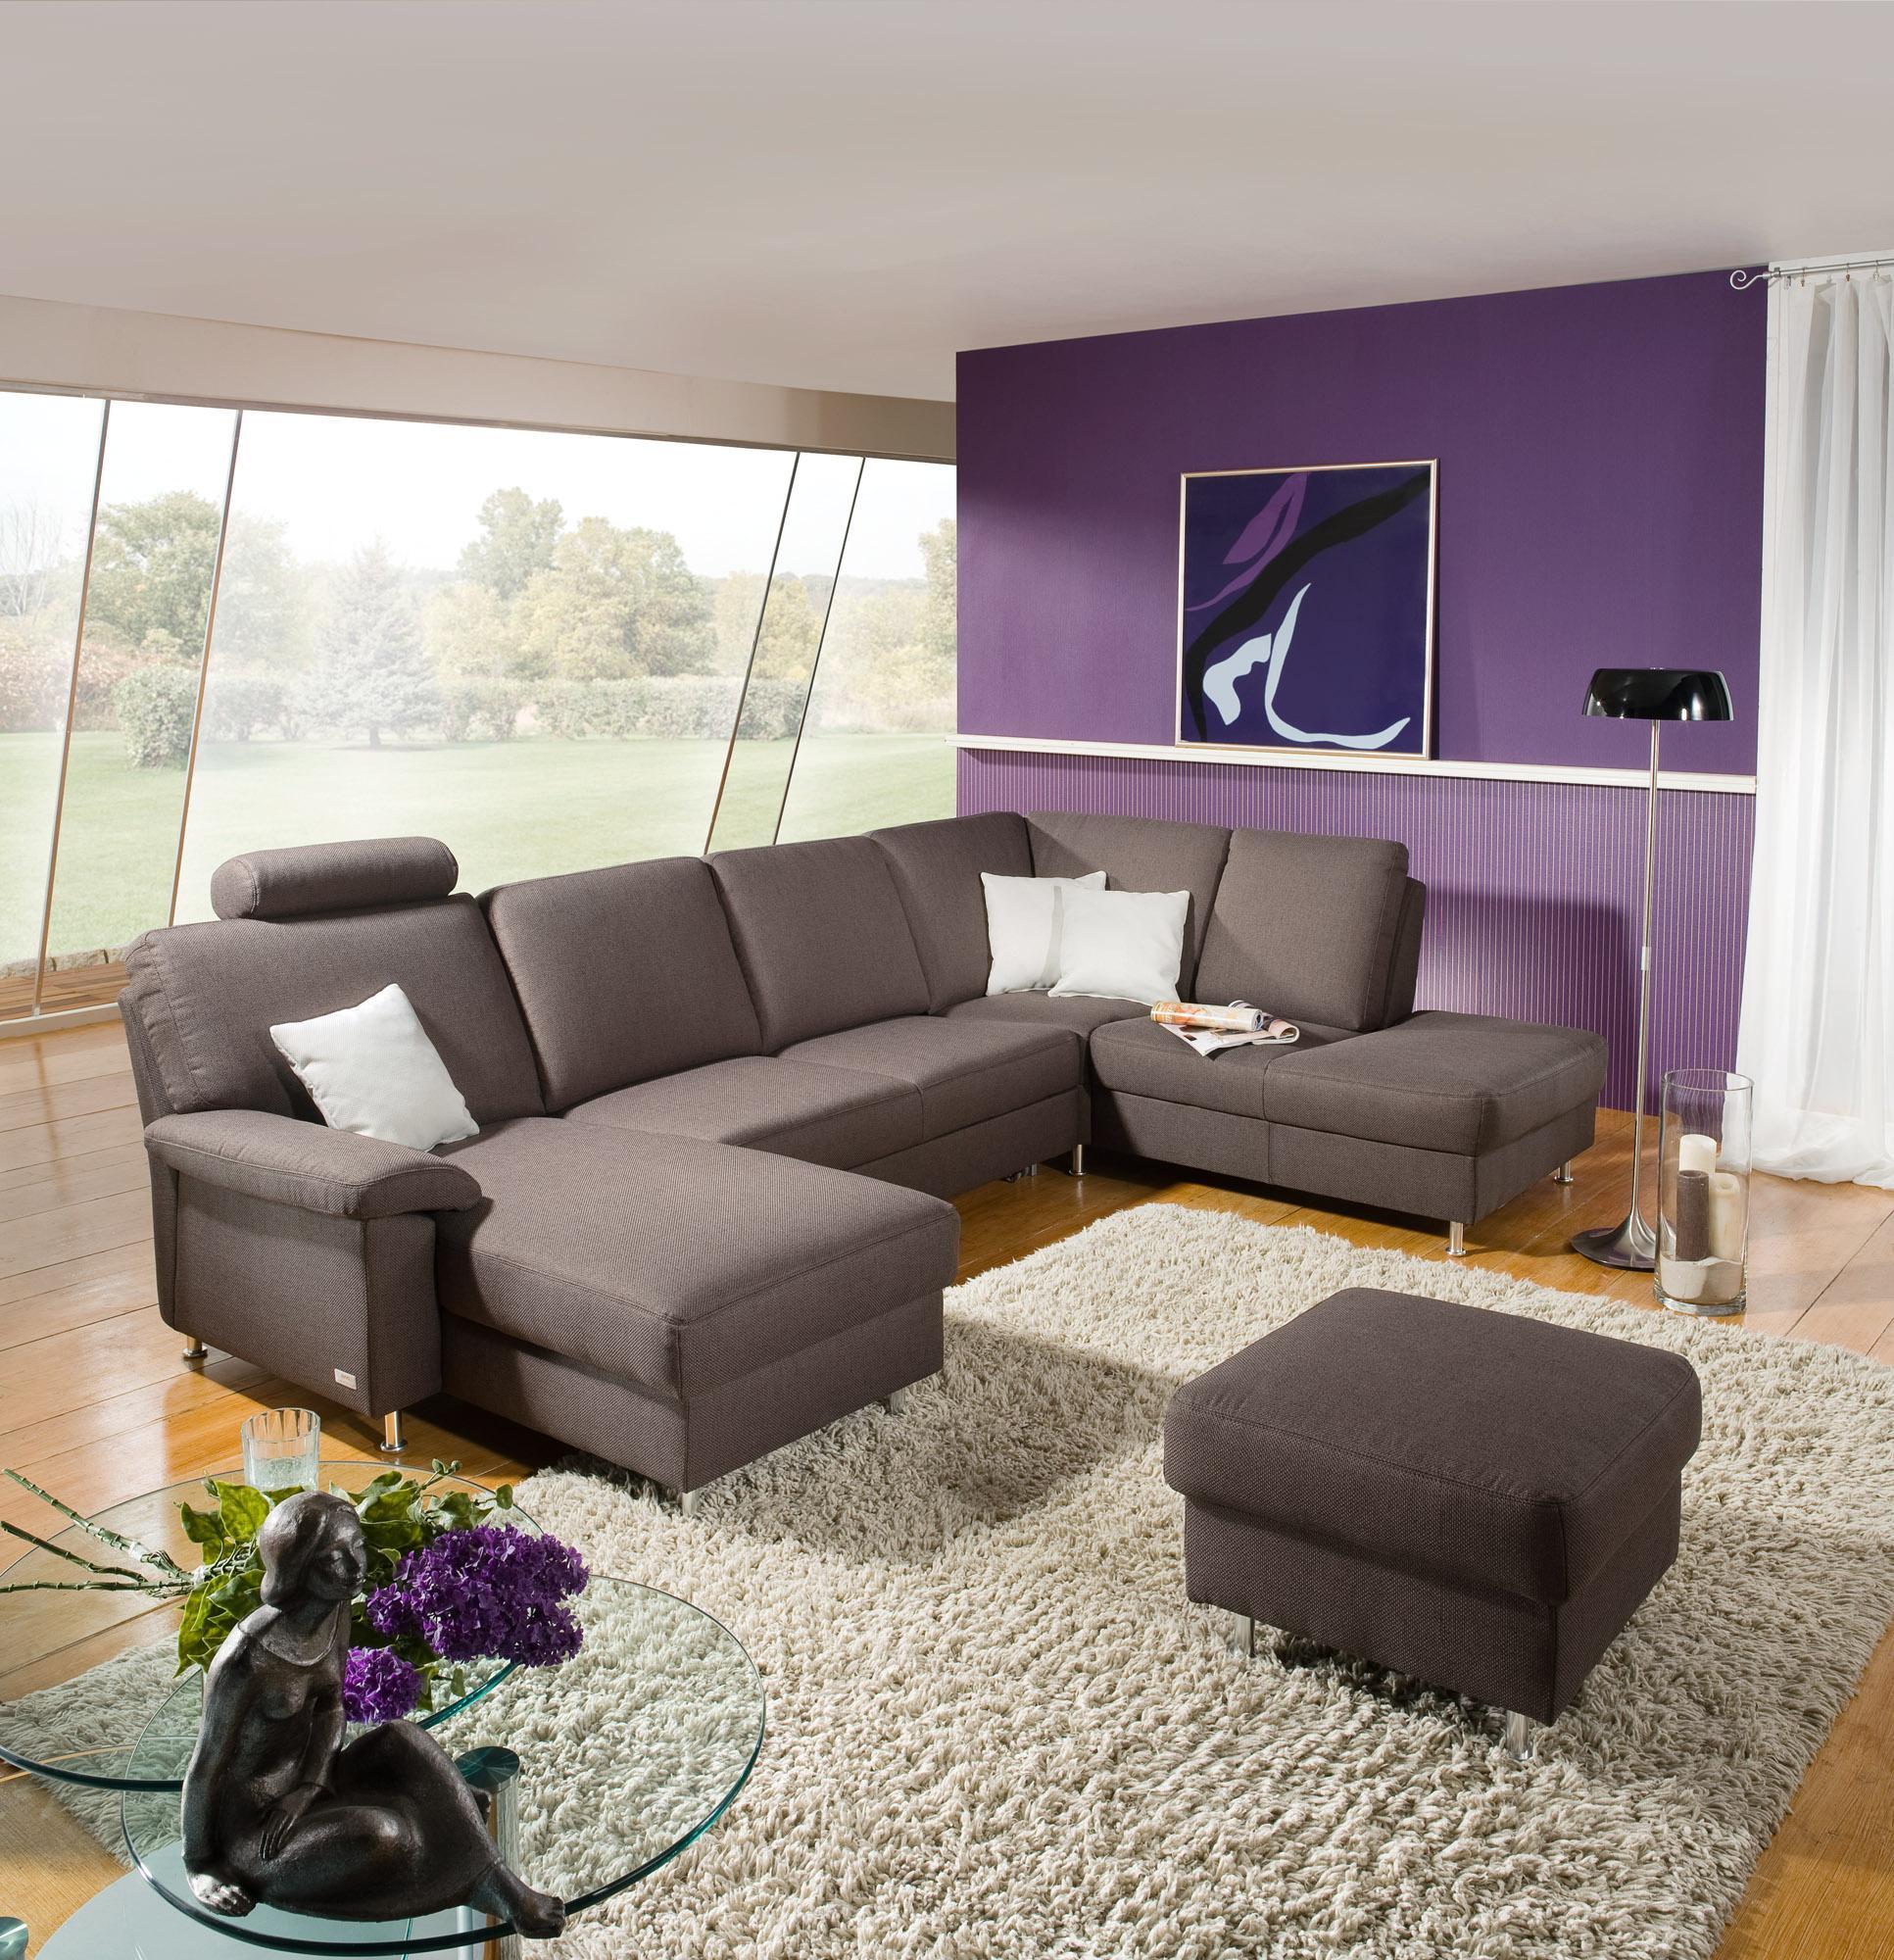 m belh user th ringen 9385 made house decor. Black Bedroom Furniture Sets. Home Design Ideas